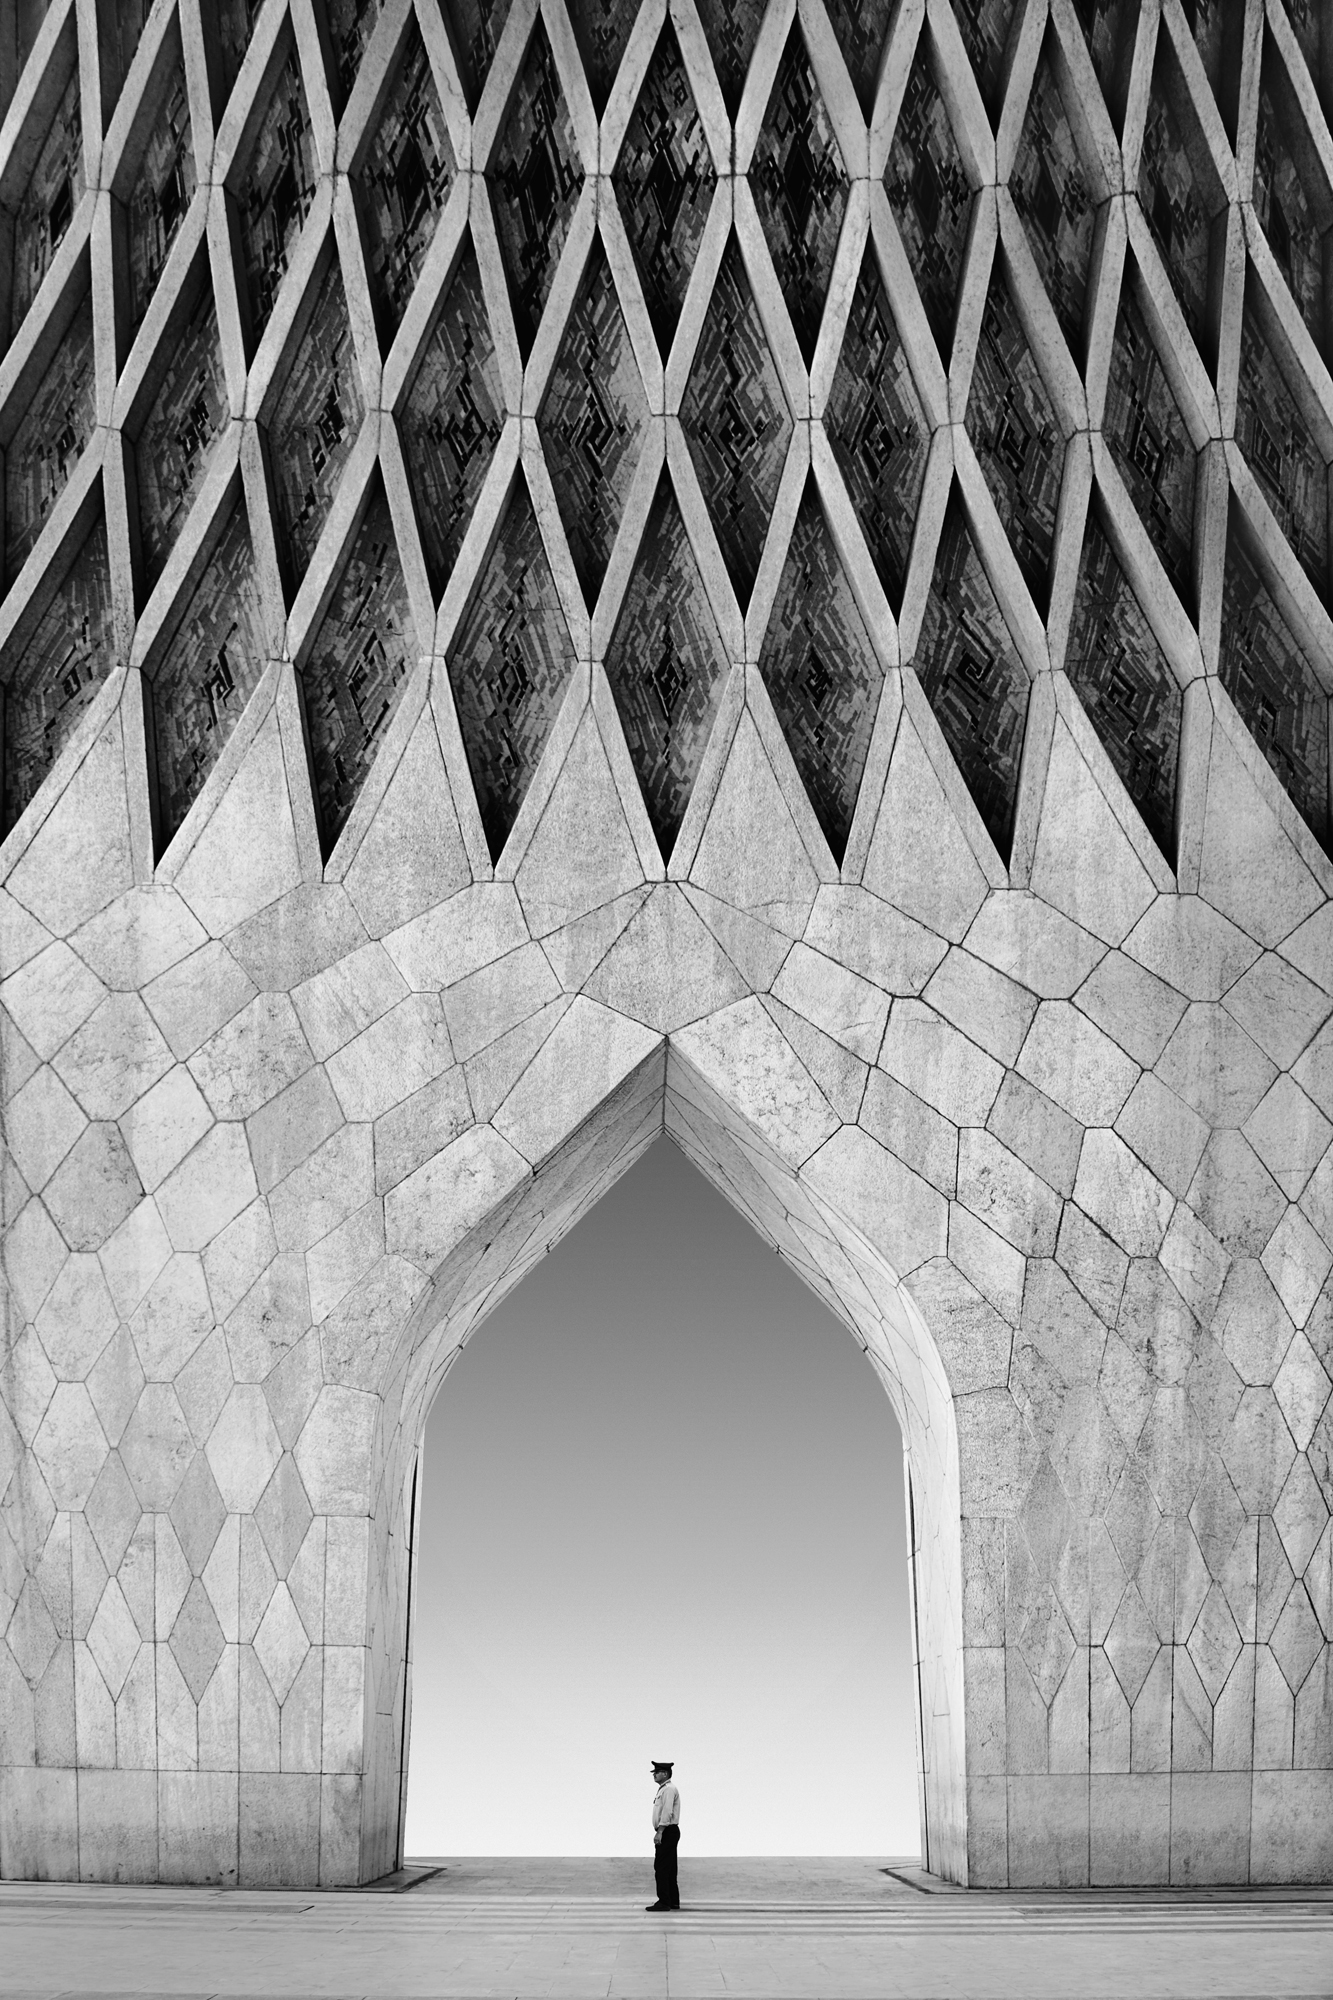 Categorie: Architecture & Interior, Fine Art, Street - Photographer: MOHAMMAD DADSETAN - Location: Iran, Tehran